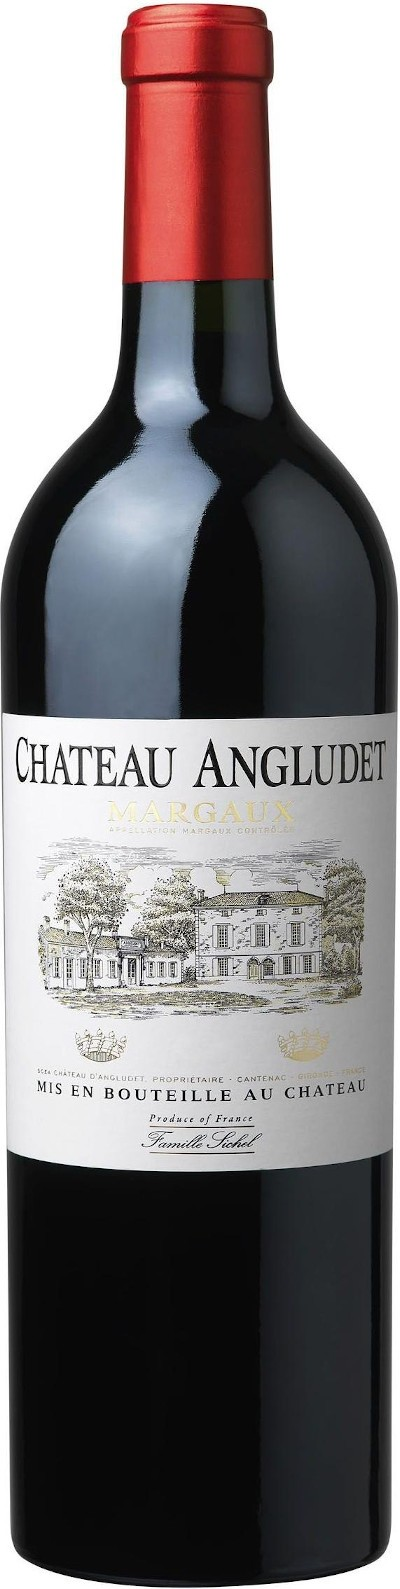 Chateau Angludet - Margaux, 2012